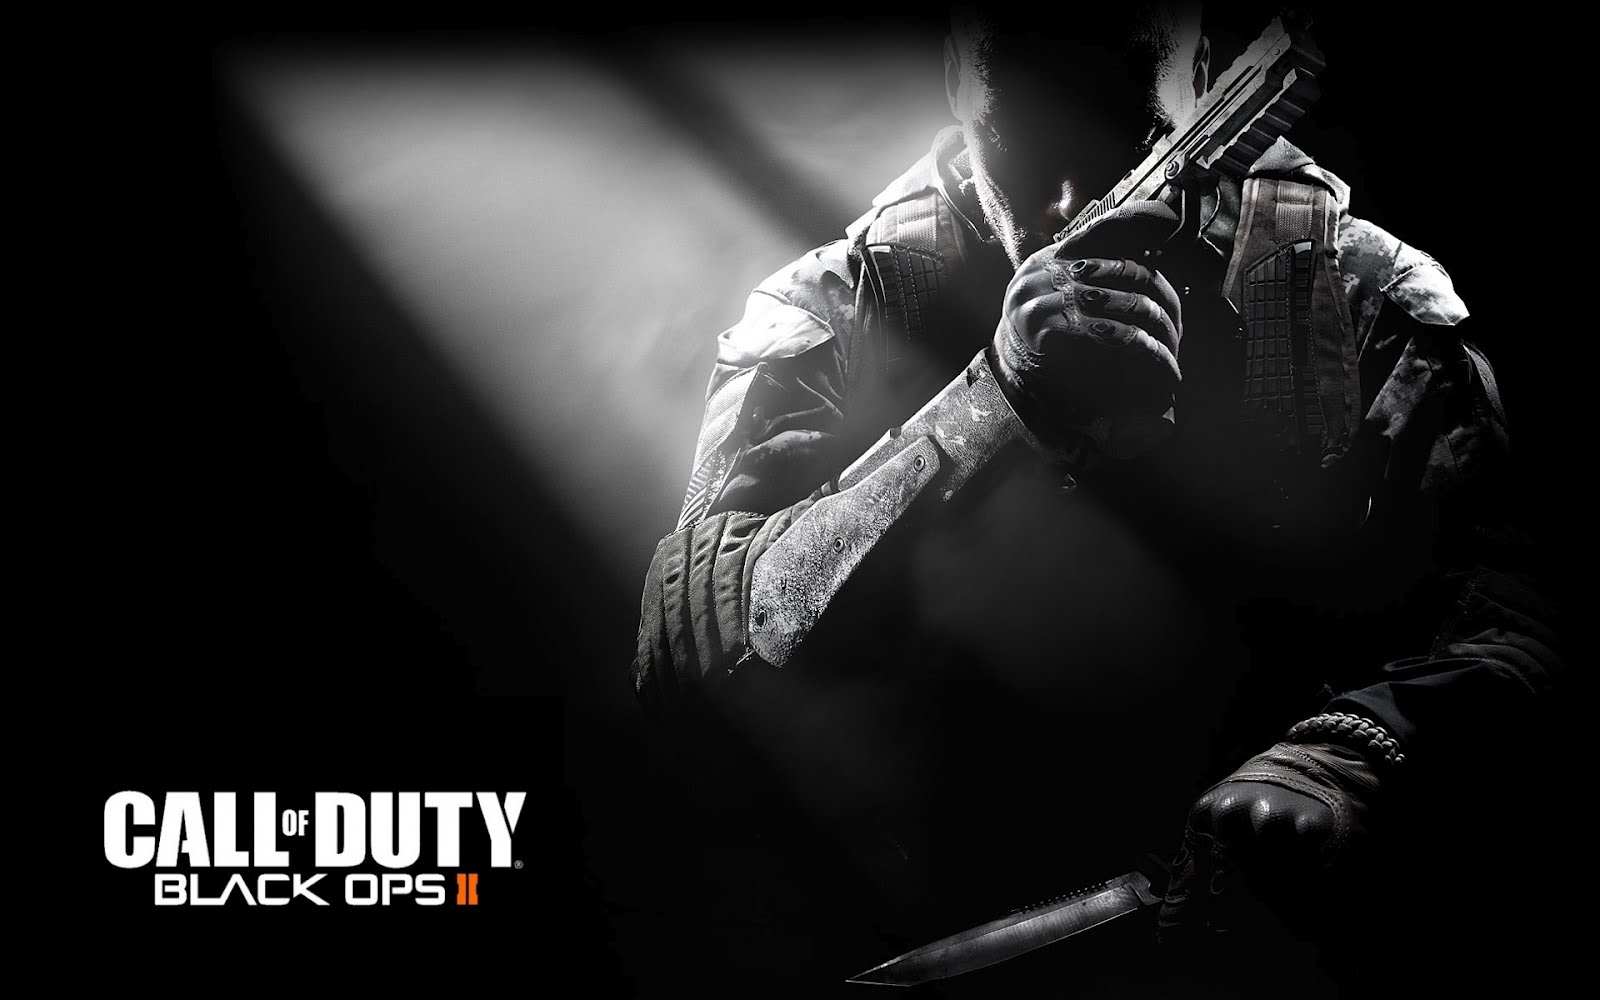 Black Ops 2 II